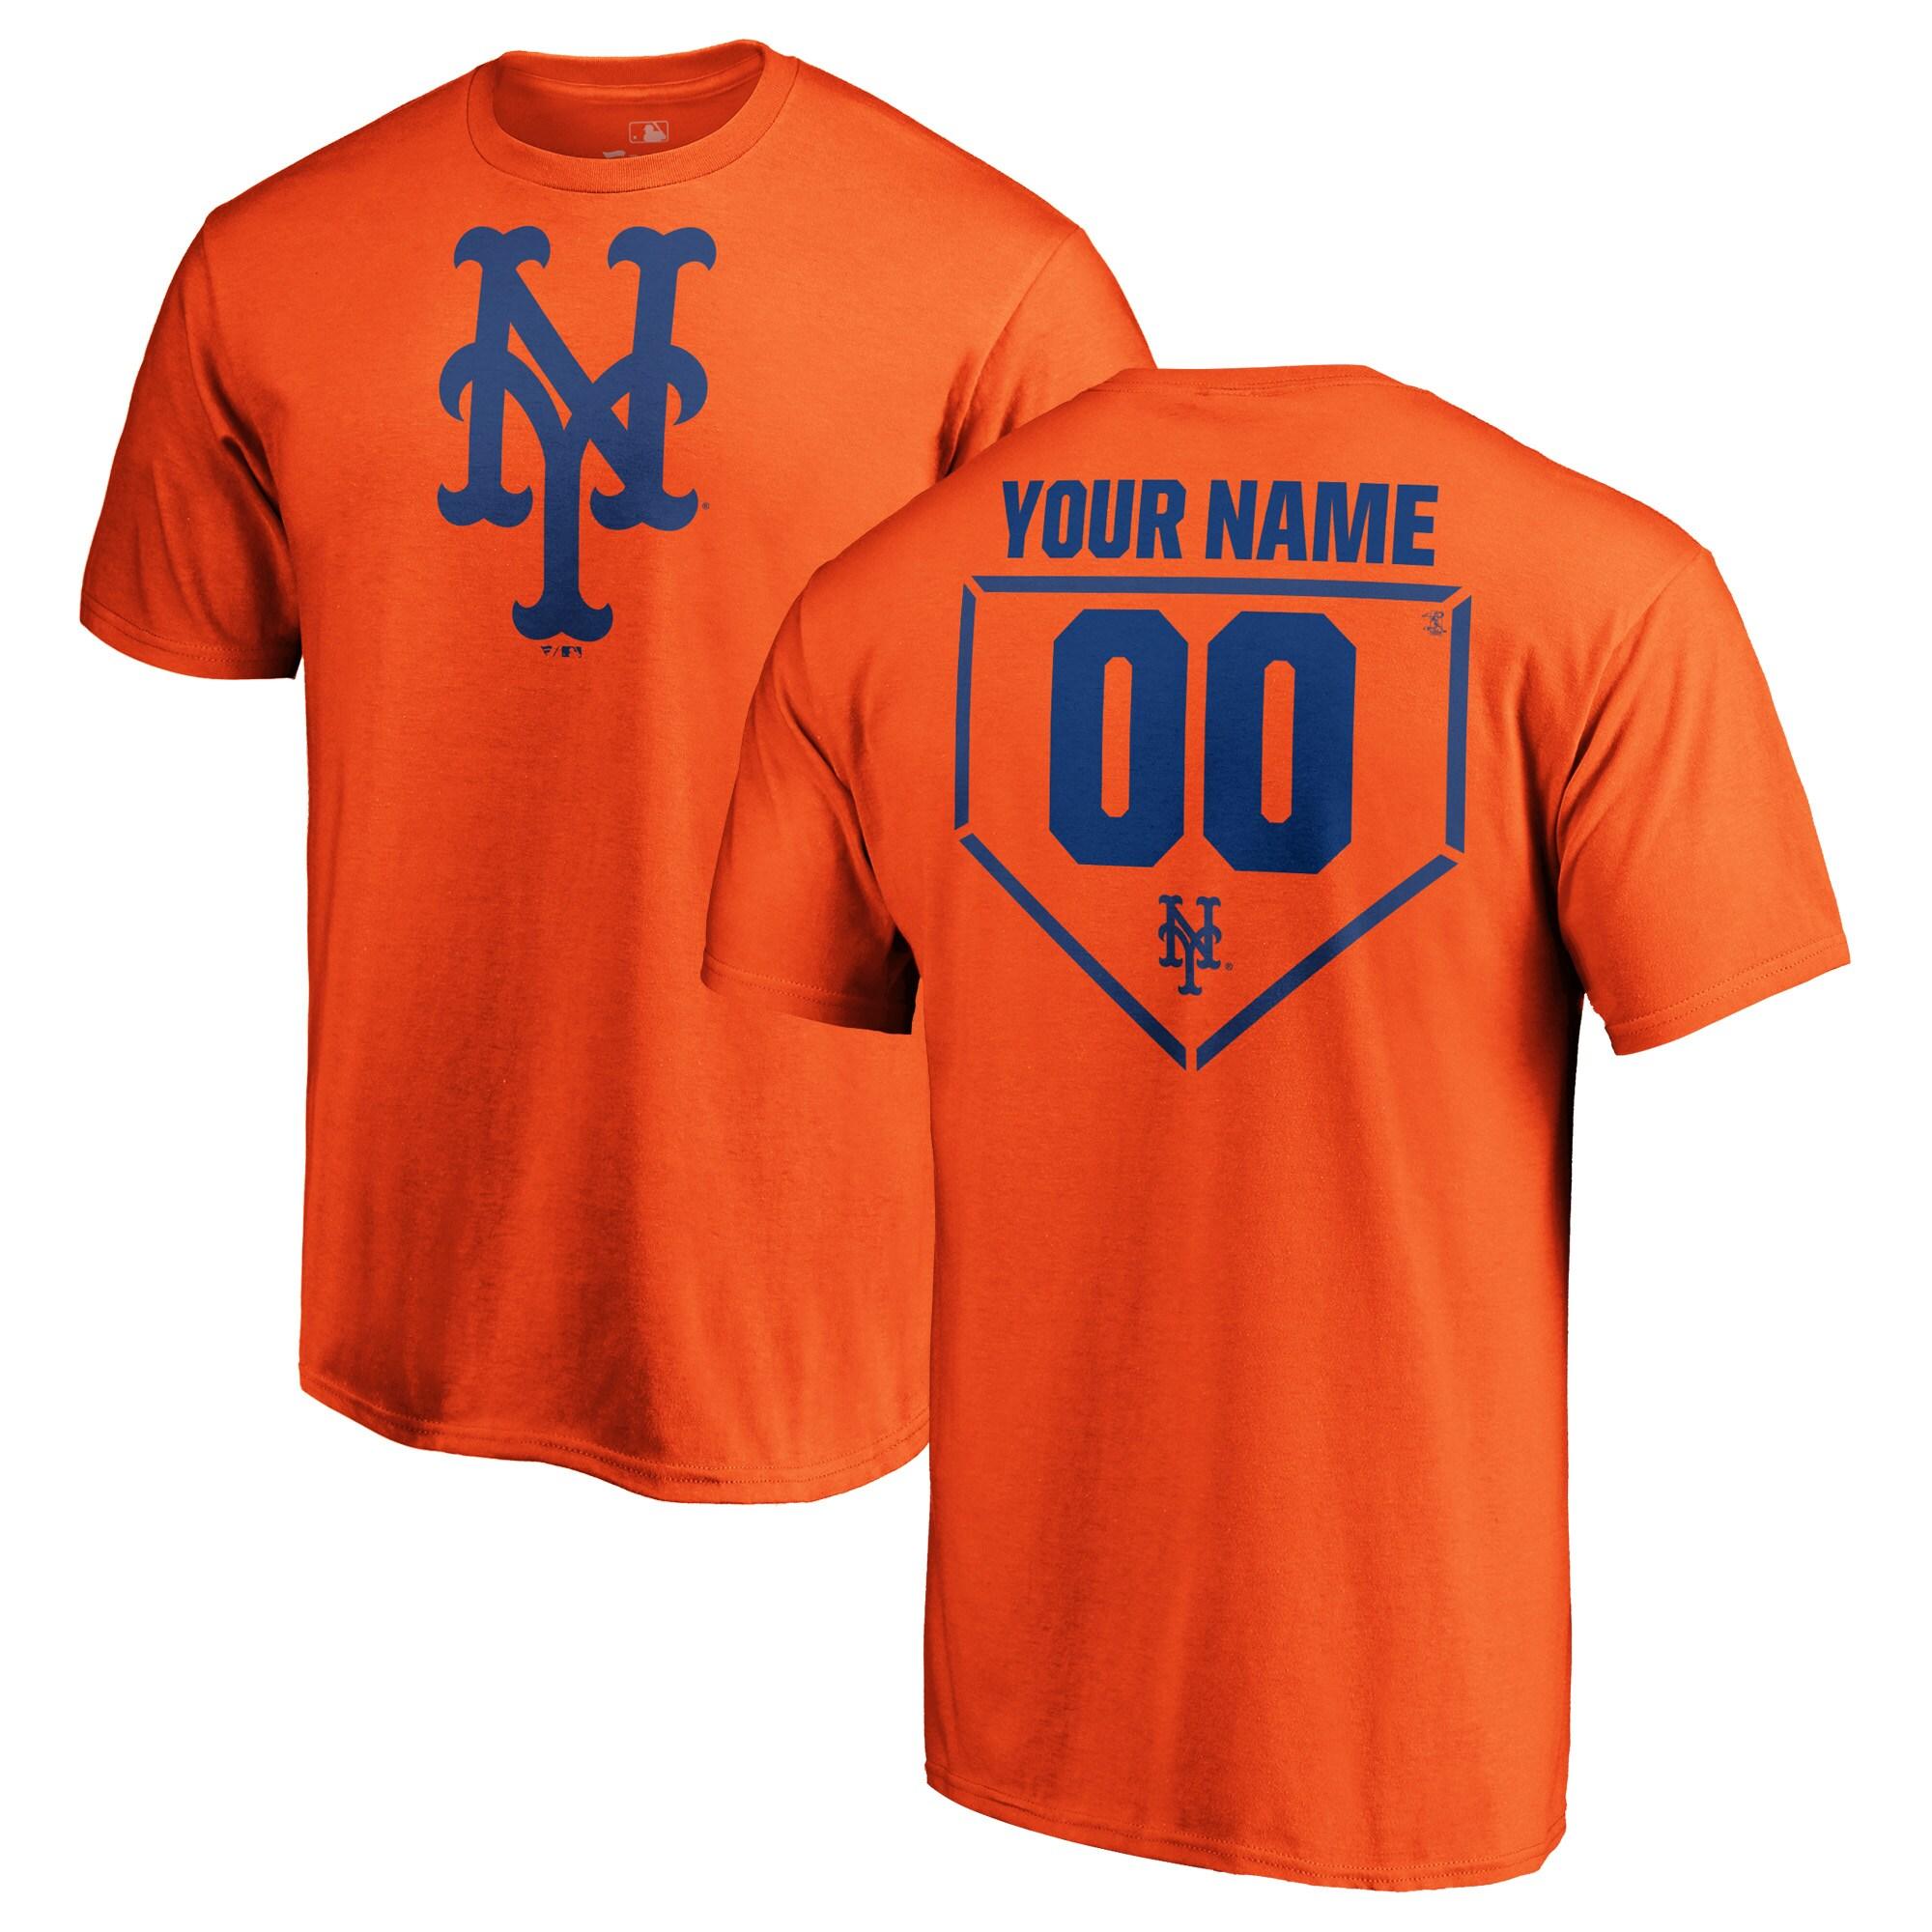 New York Mets Fanatics Branded Personalized RBI T-Shirt - Orange